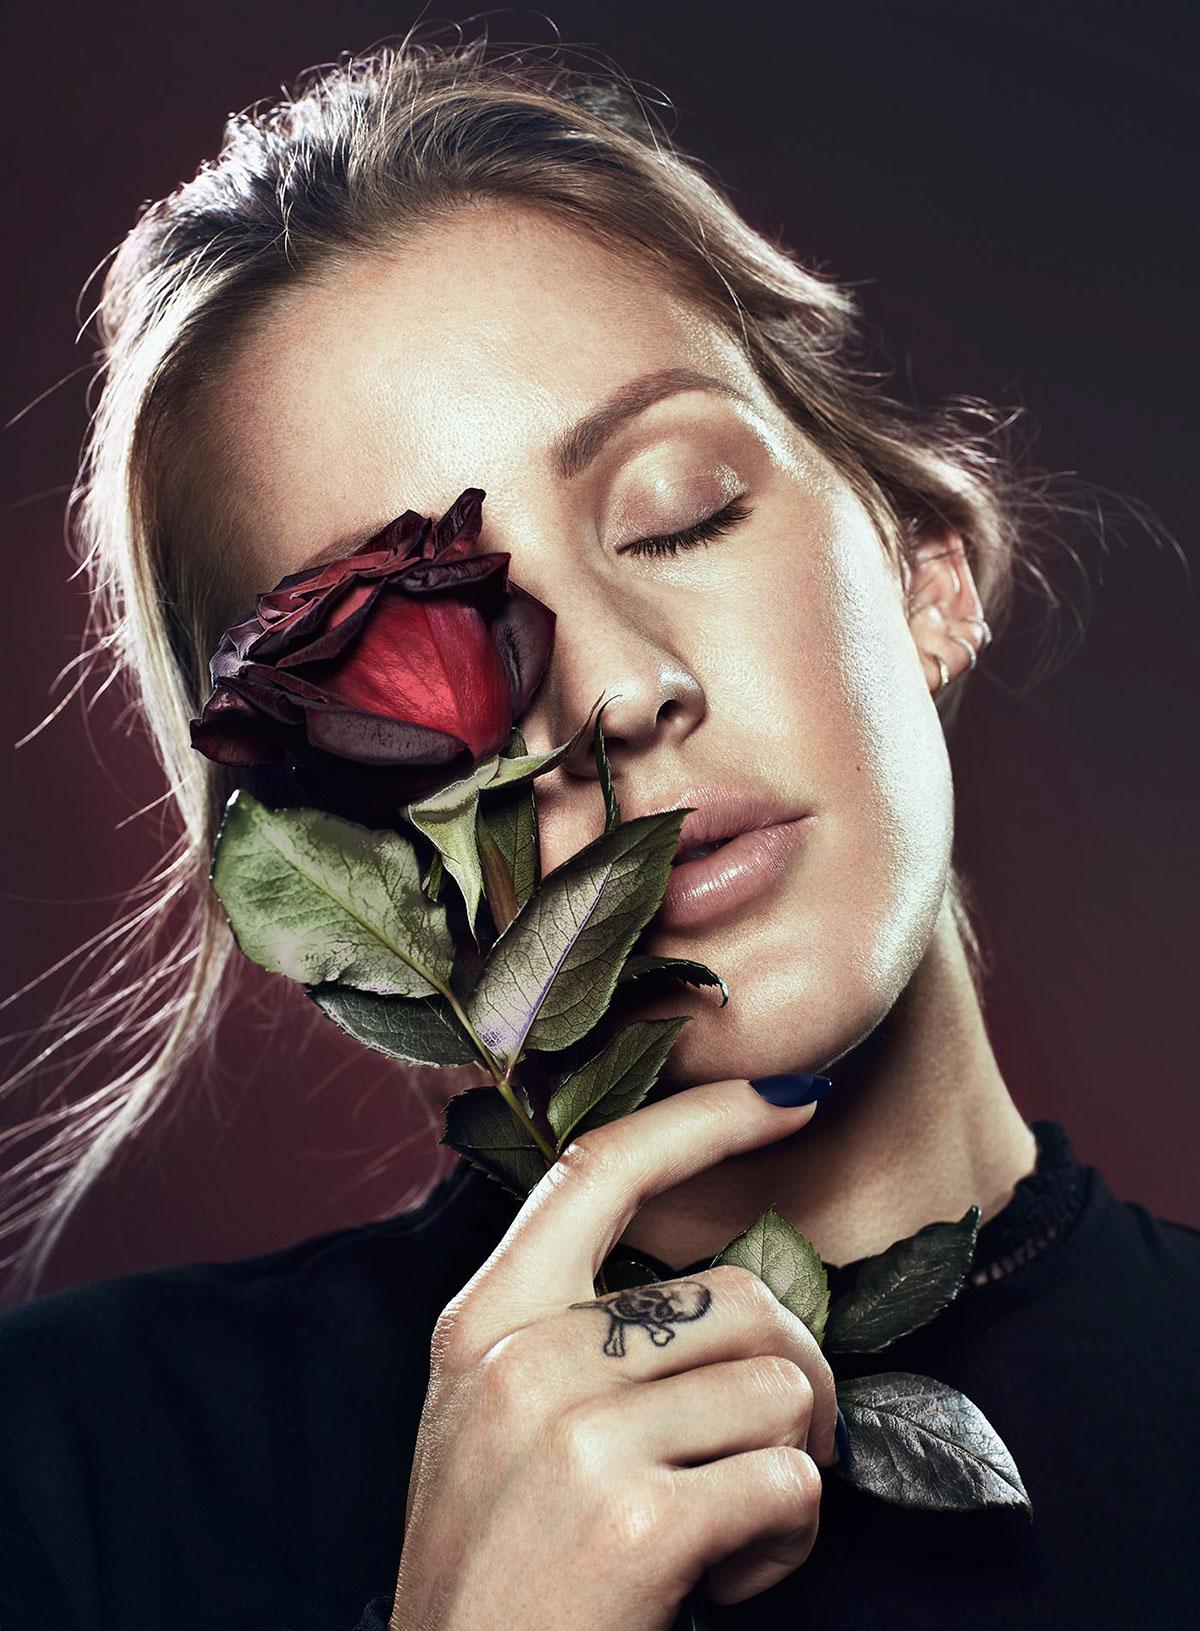 7be9b468b1 Ellie Goulding for Stylist Magazine - Karina Twiss on Wacom Gallery